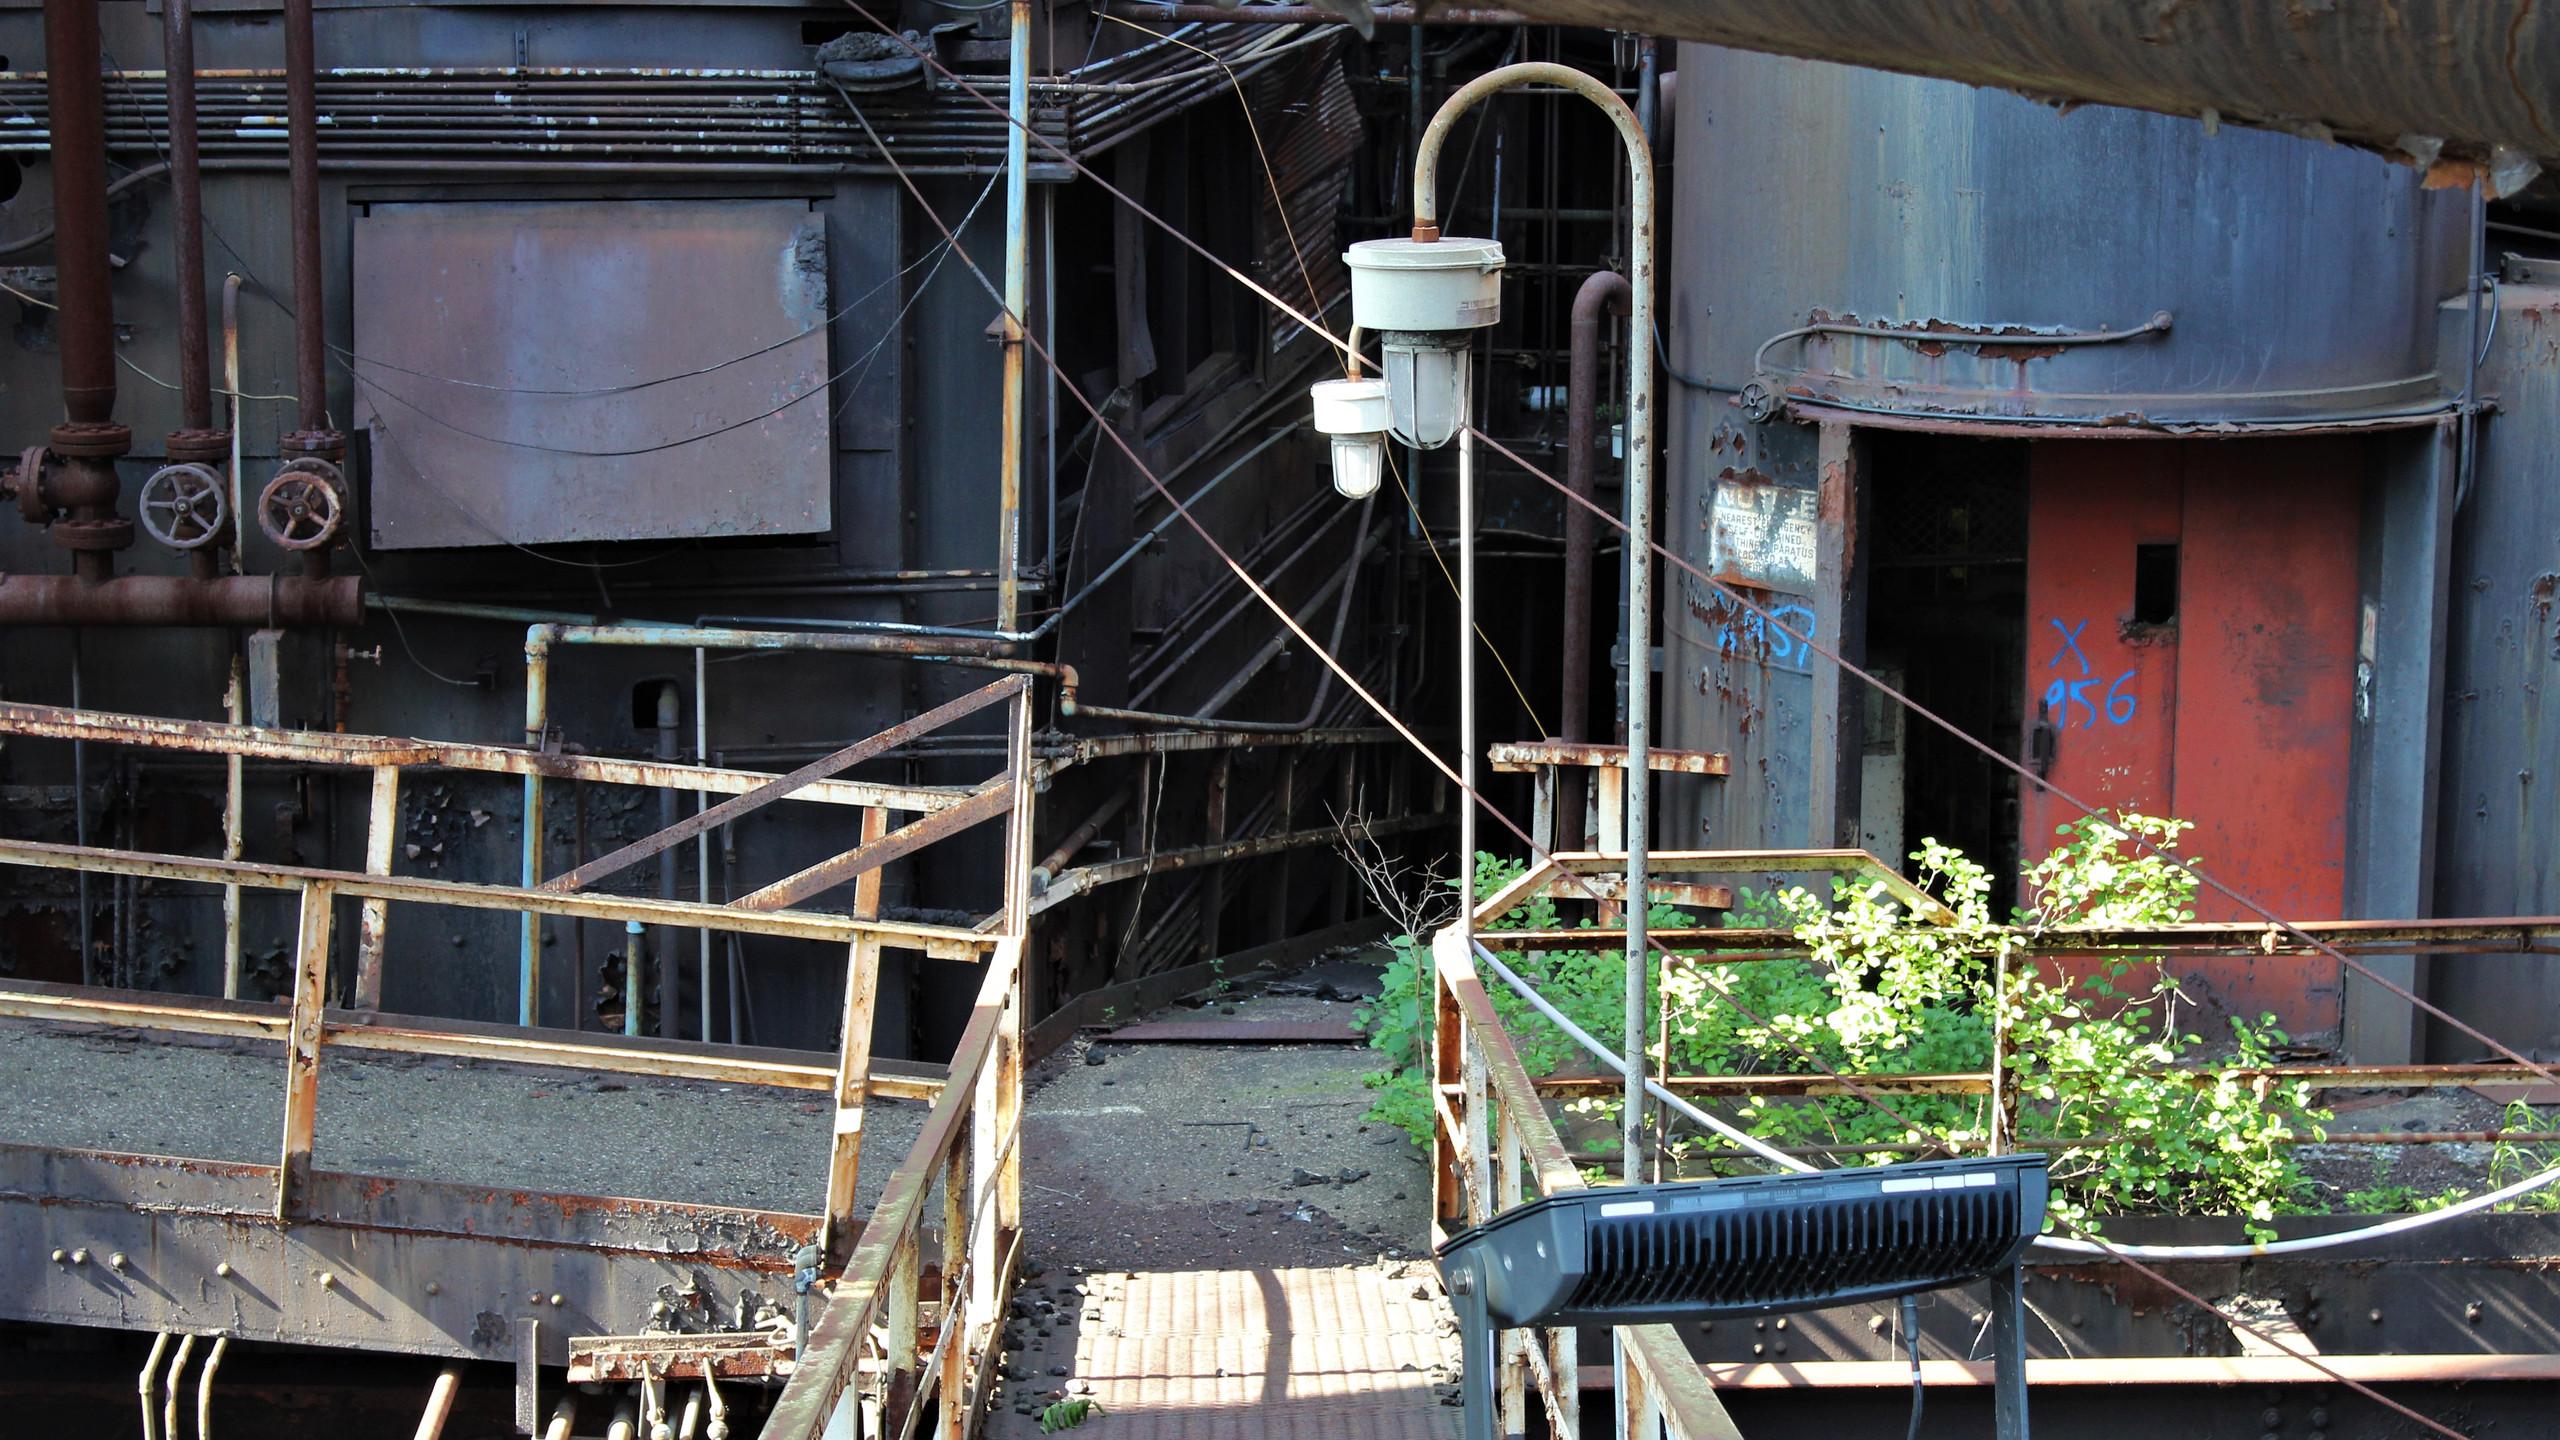 Walkway Inside the Plant